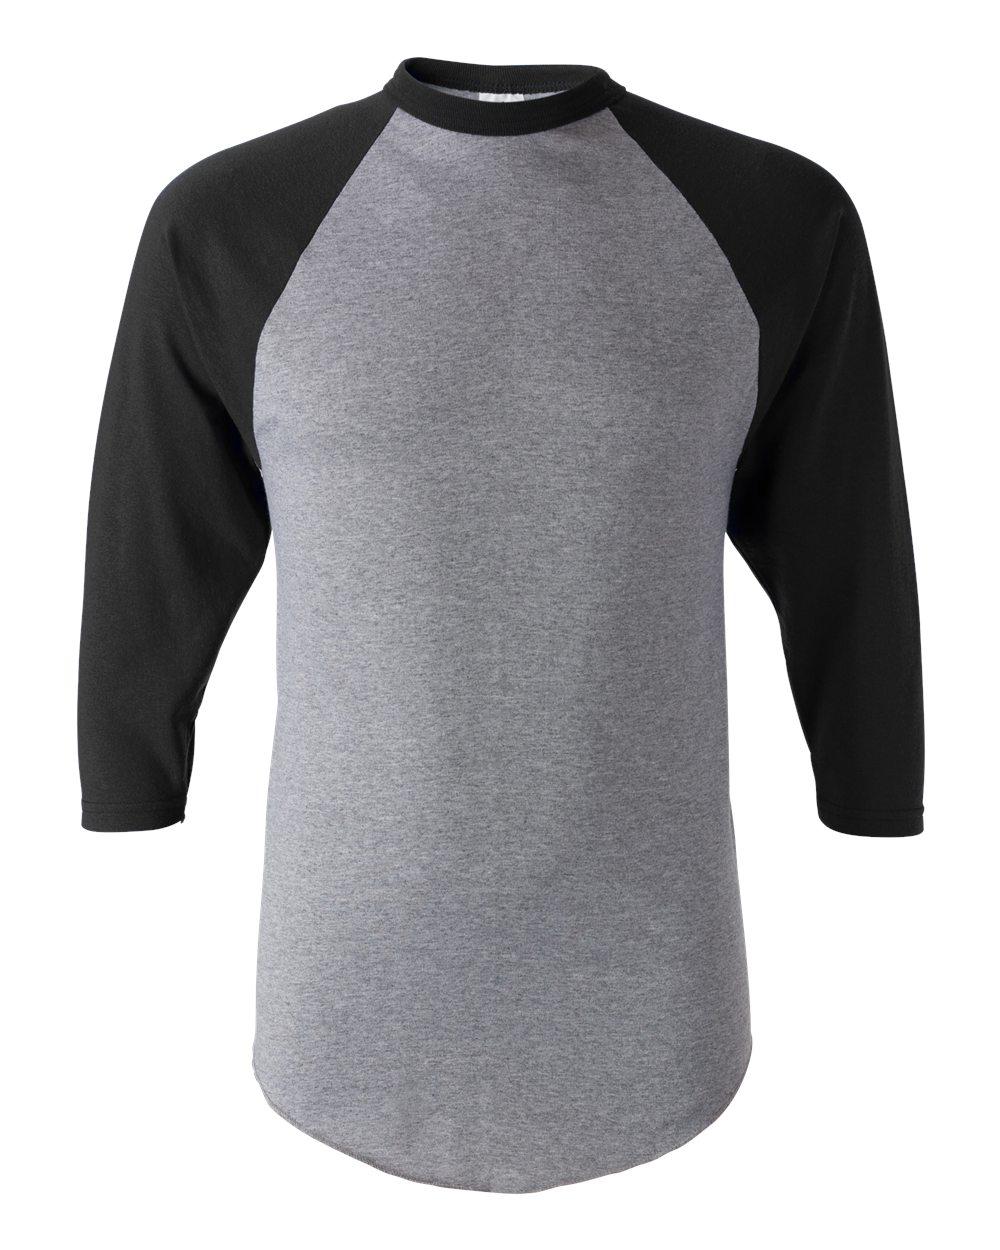 Augusta Sportswear 4420 - Men's Three-Quarter Sleeve ...